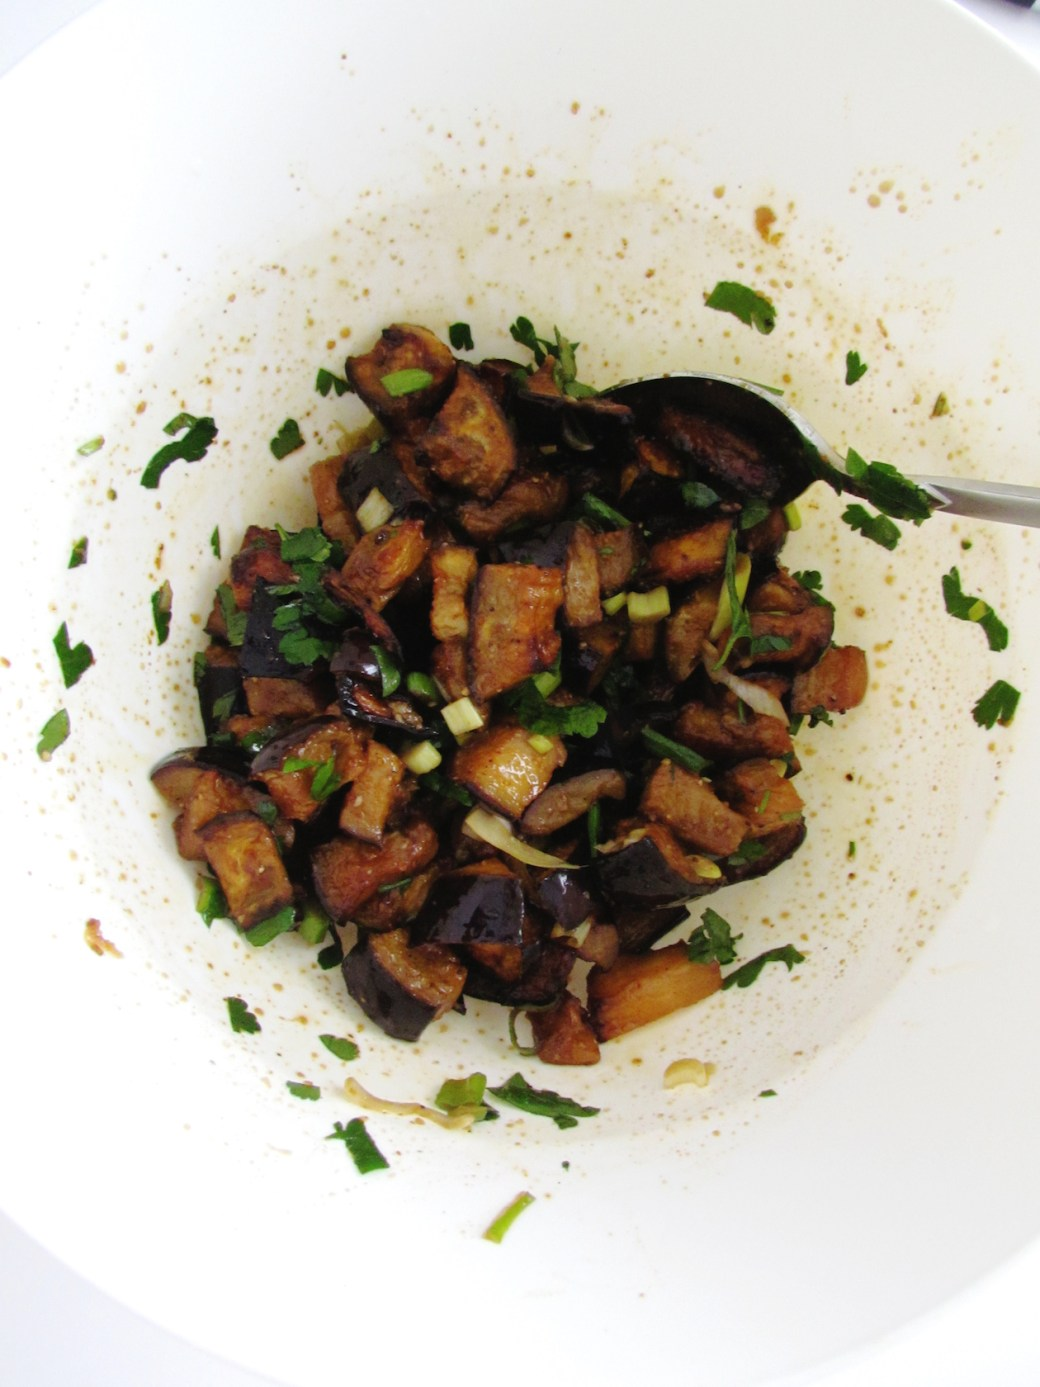 salade d'aubergines rôties et amandes | www.savormania.com